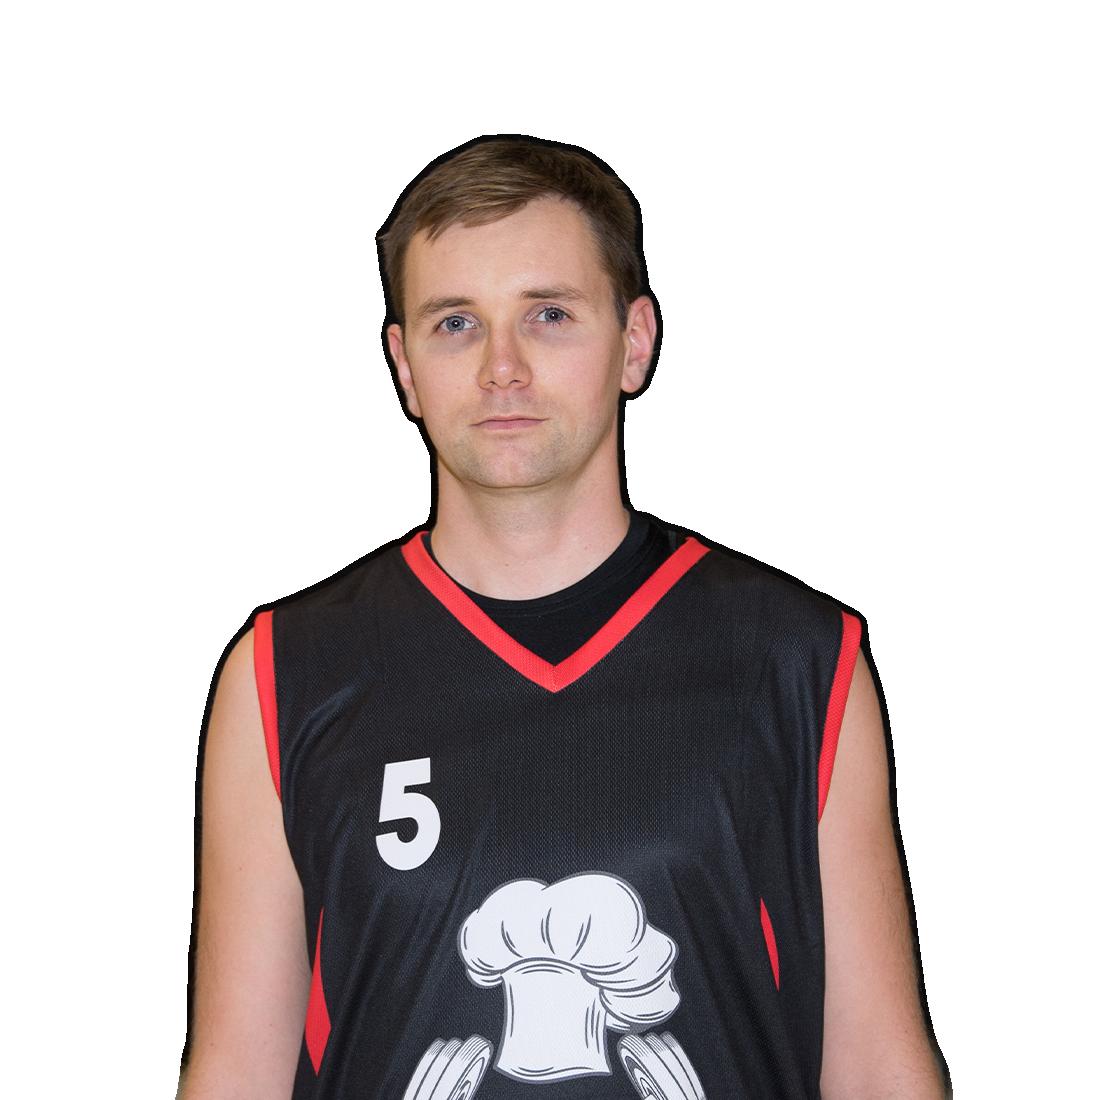 Dariusz Falkus